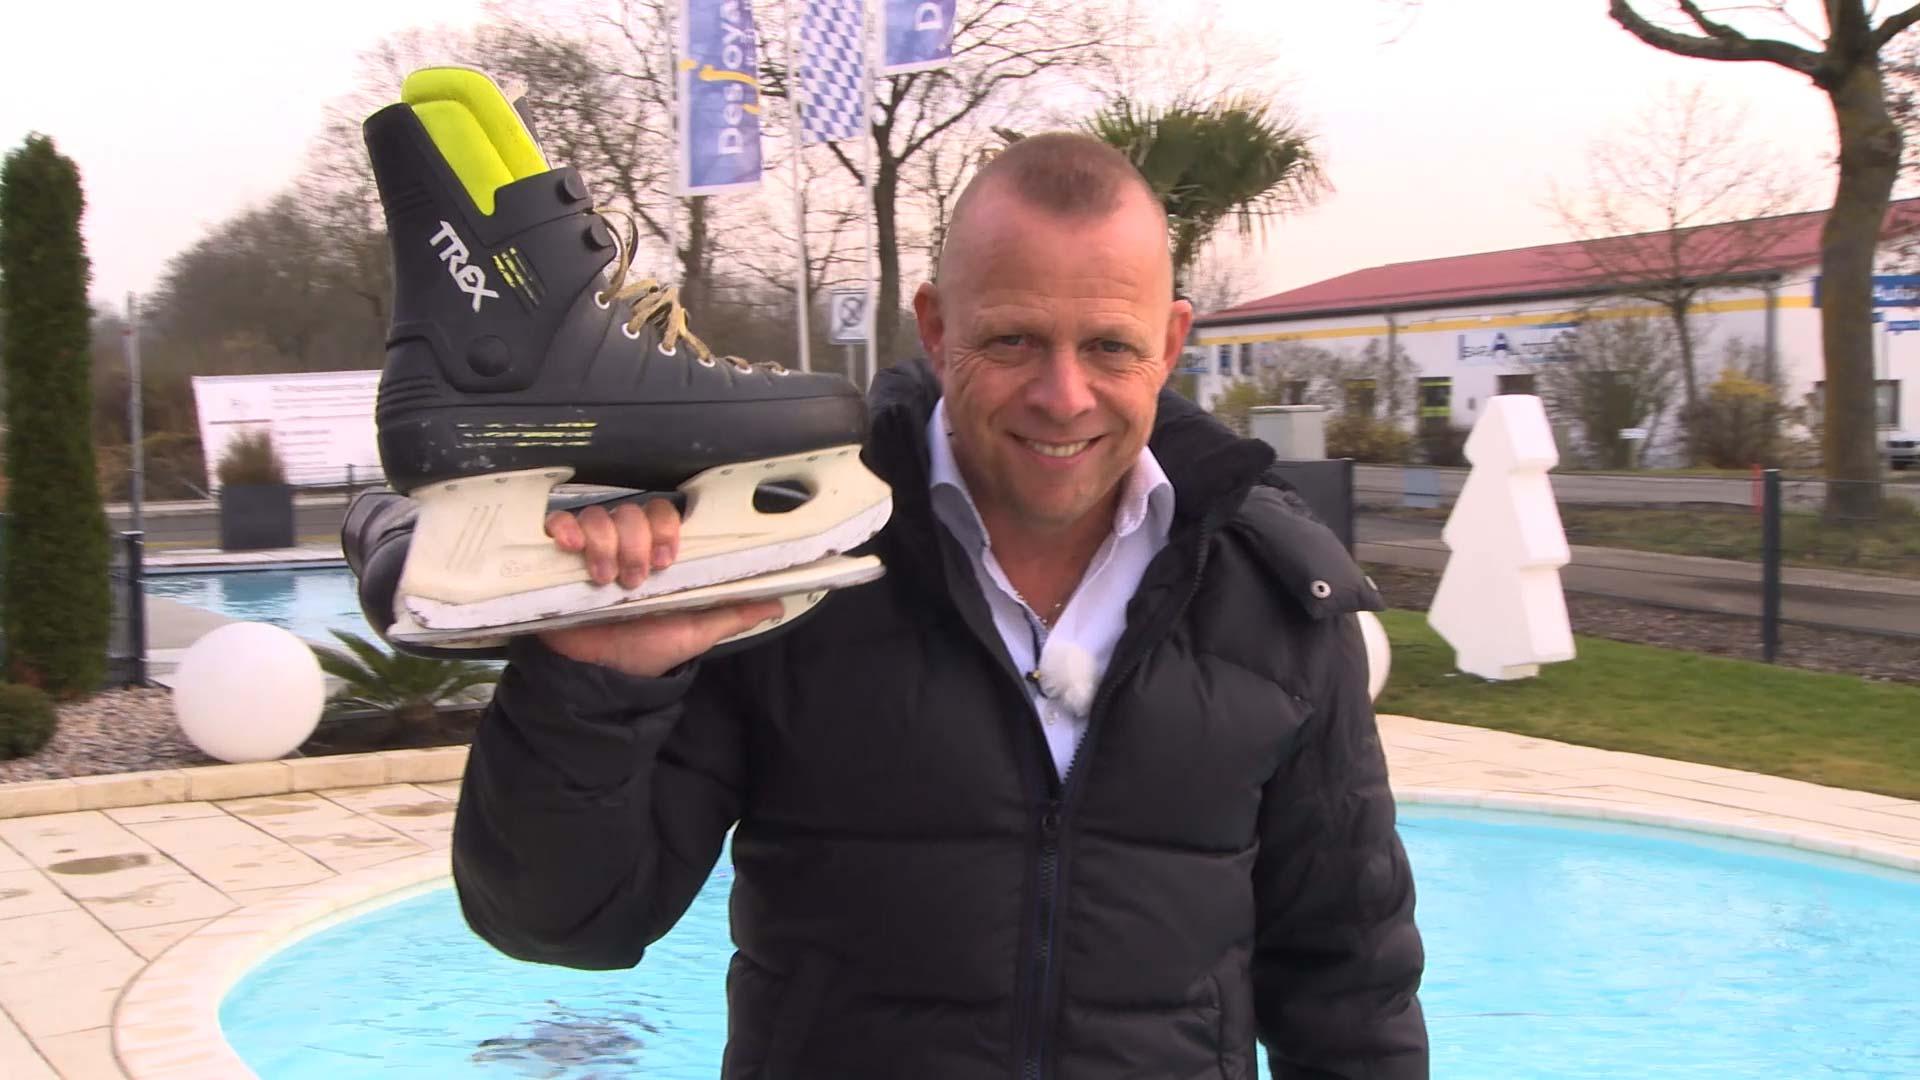 Swimming-Pool Schlittschuh laufen